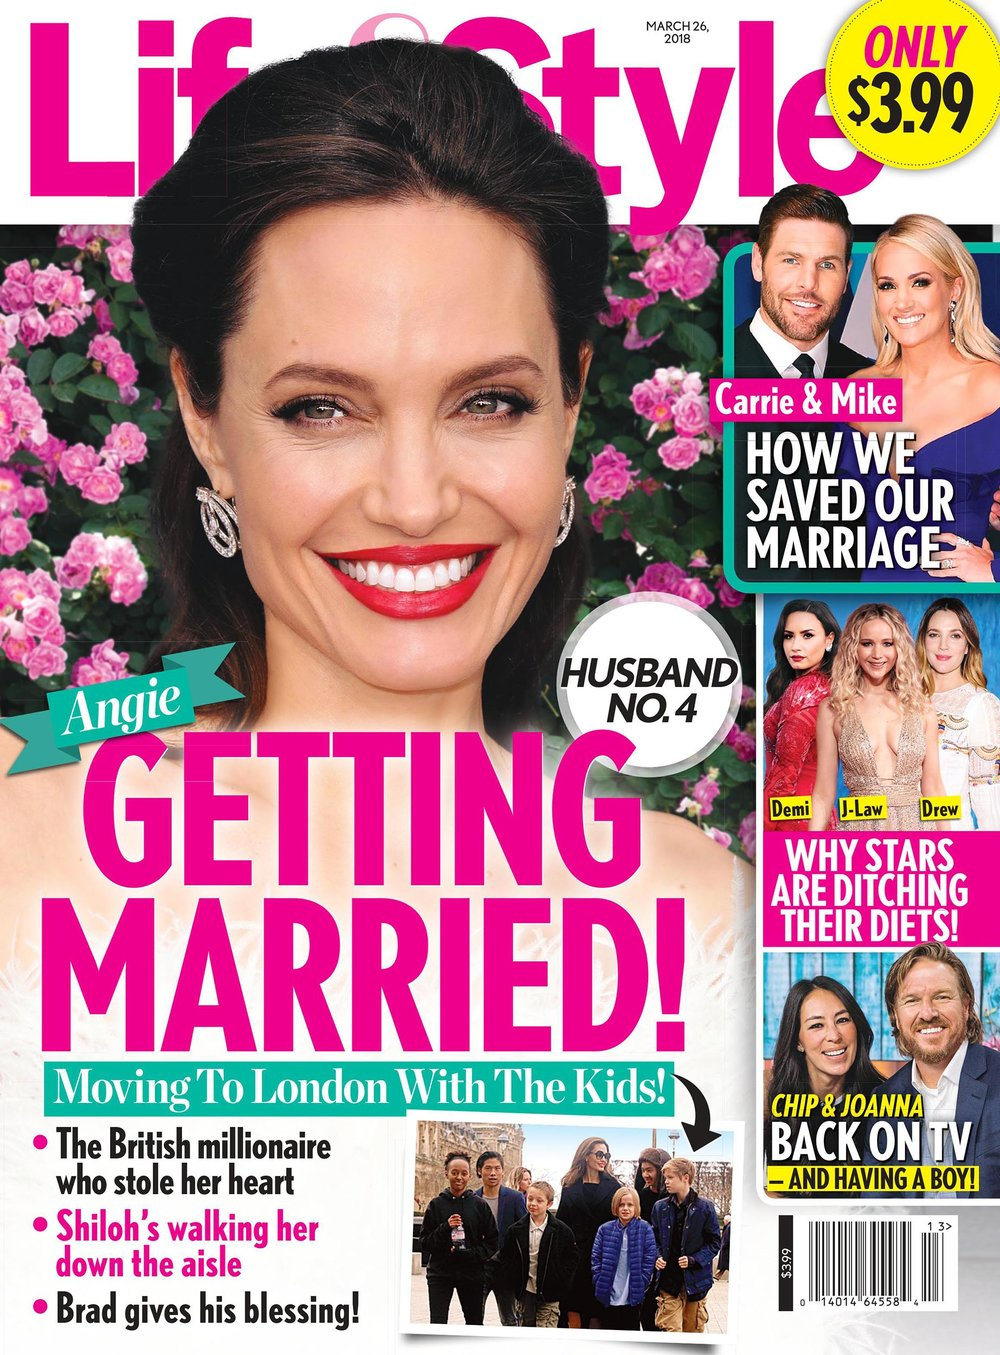 3.26.18 Life & Style Magazine Cover ML.jpg